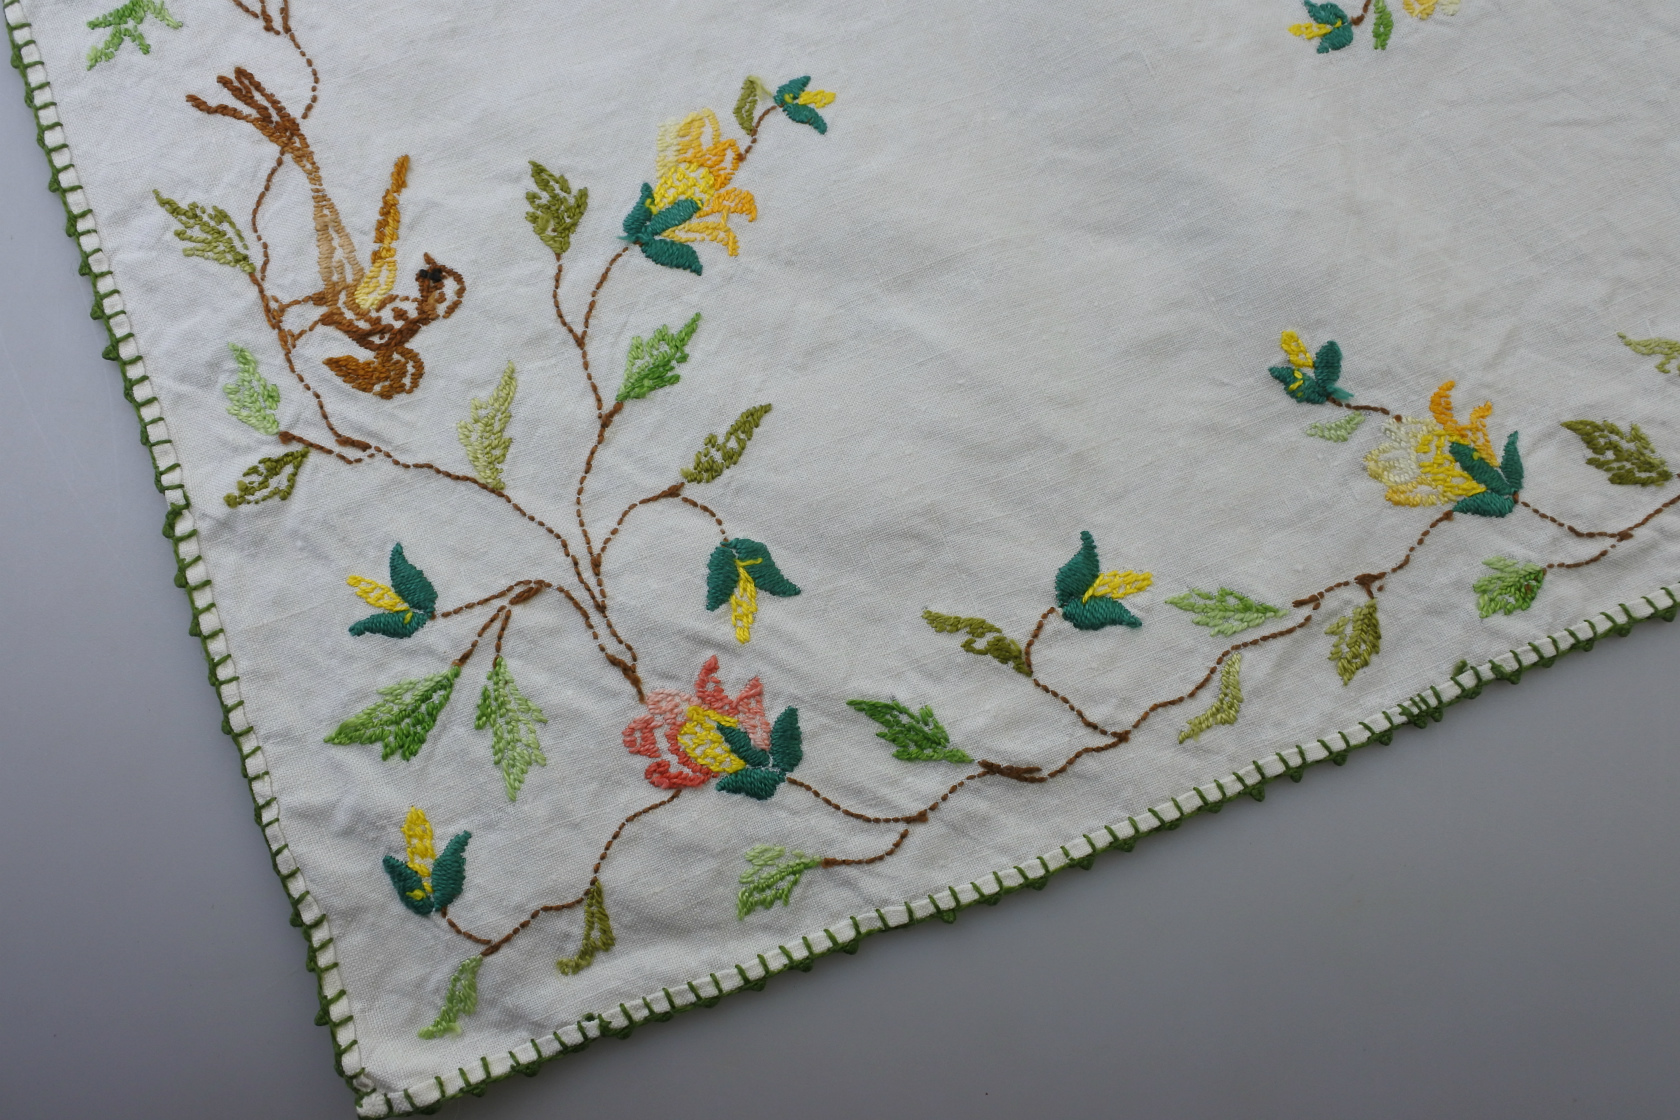 vi-birdplacemat